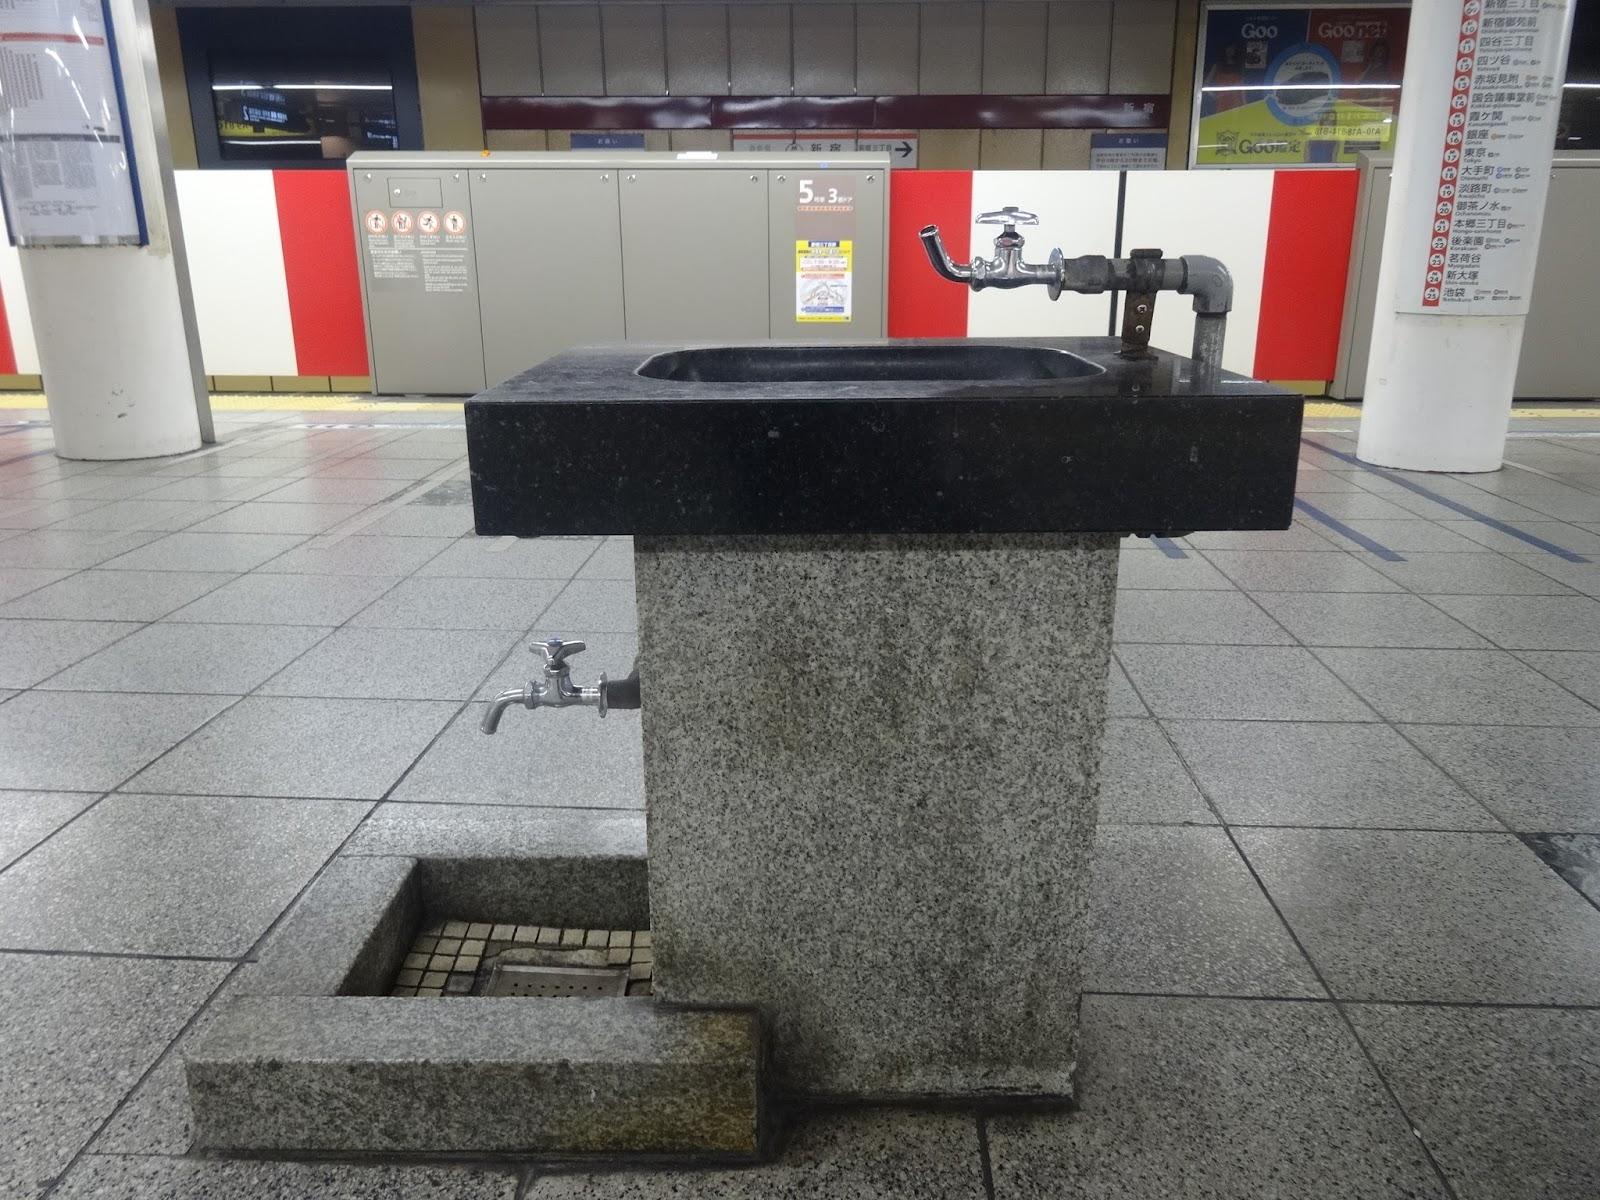 水飲み場,丸ノ内線新宿駅〈著作権フリー無料画像〉Free Stock Photos